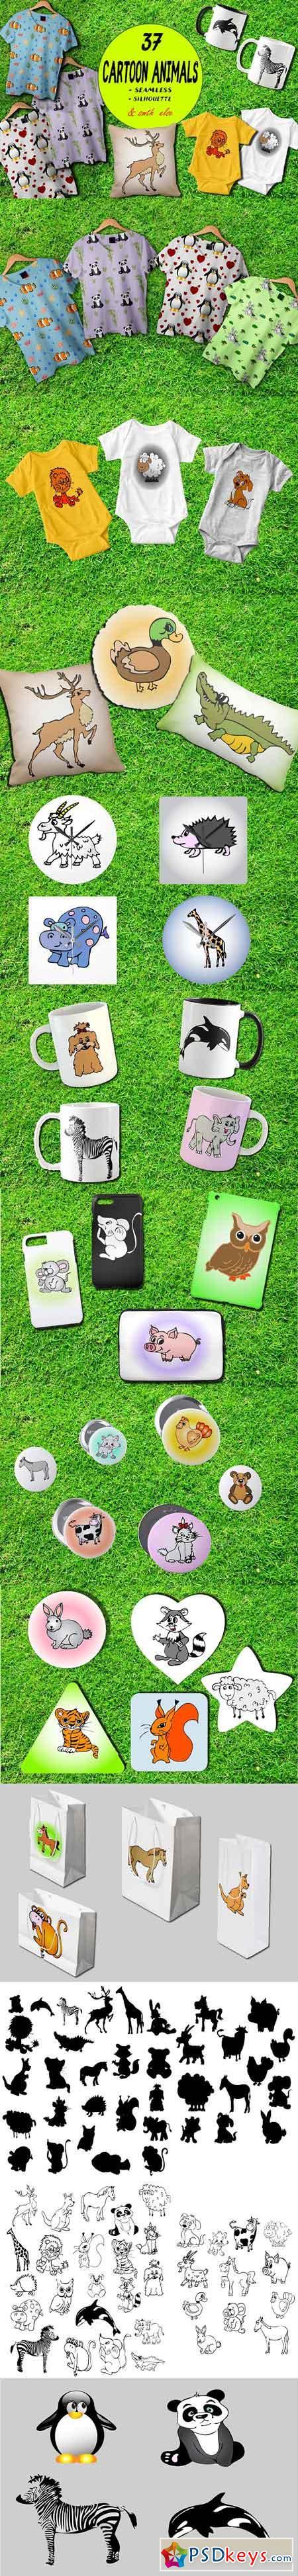 Cartoon animals collection 1739175